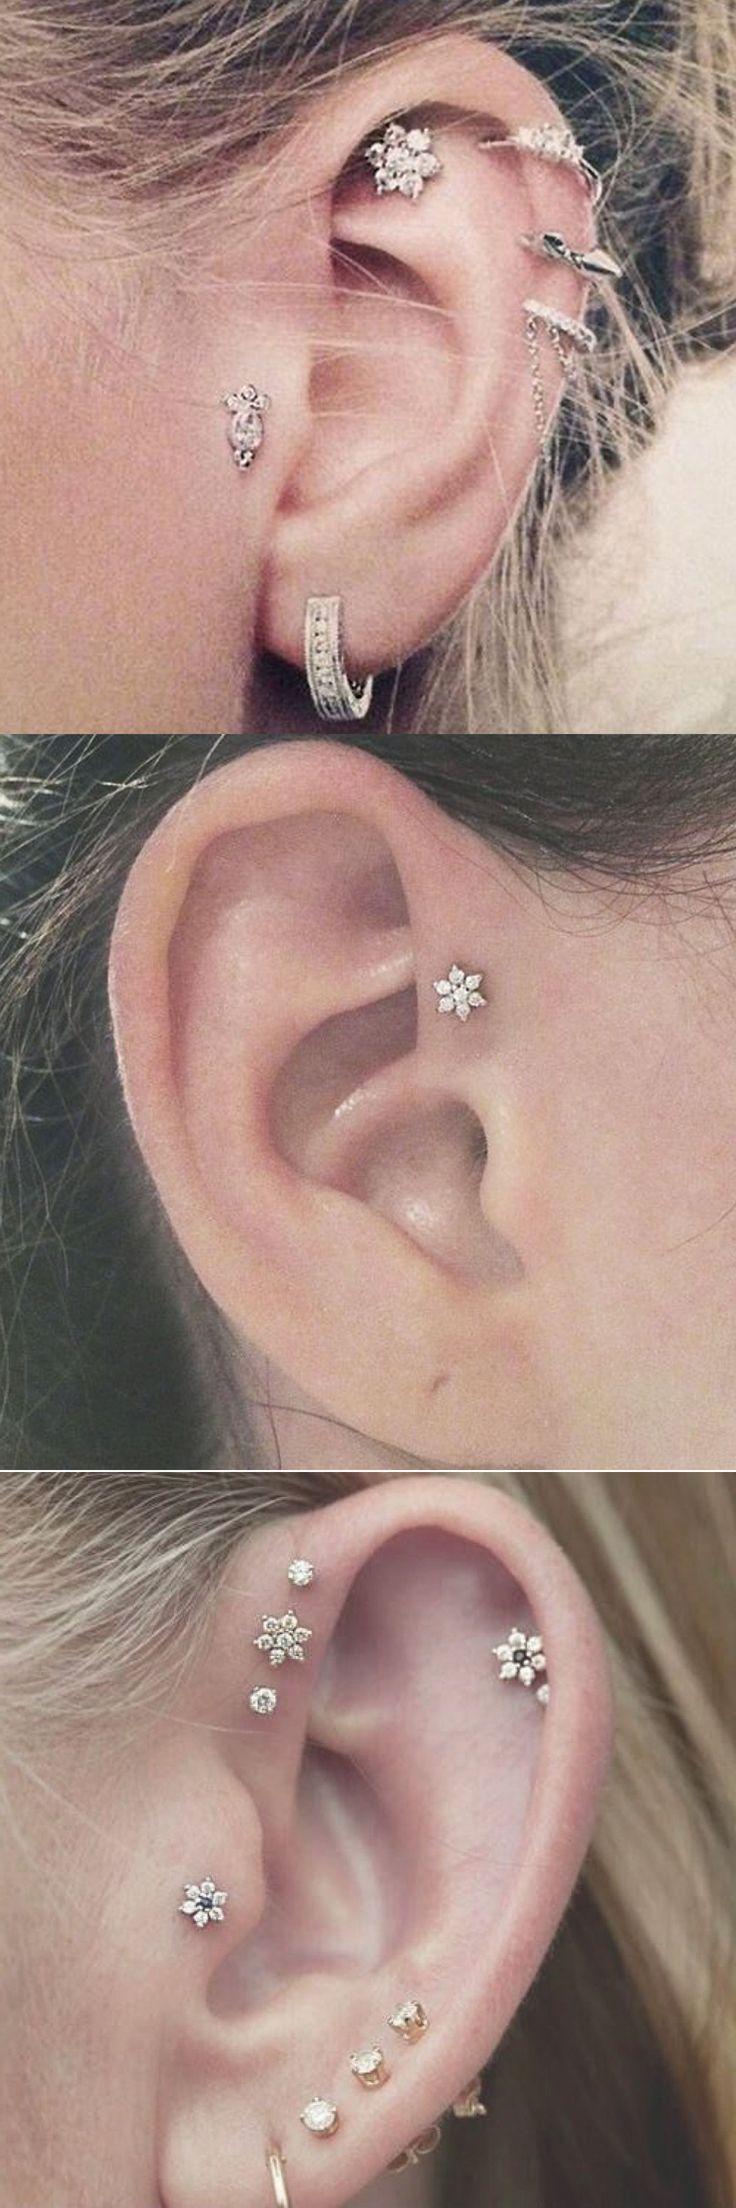 Cute Ear Piercing Ideas at MyBodiArt.com - Cartilage Earring, Triple Forward Helix Studs, Tragus Jewelry - Felicity Flower Star Crystal